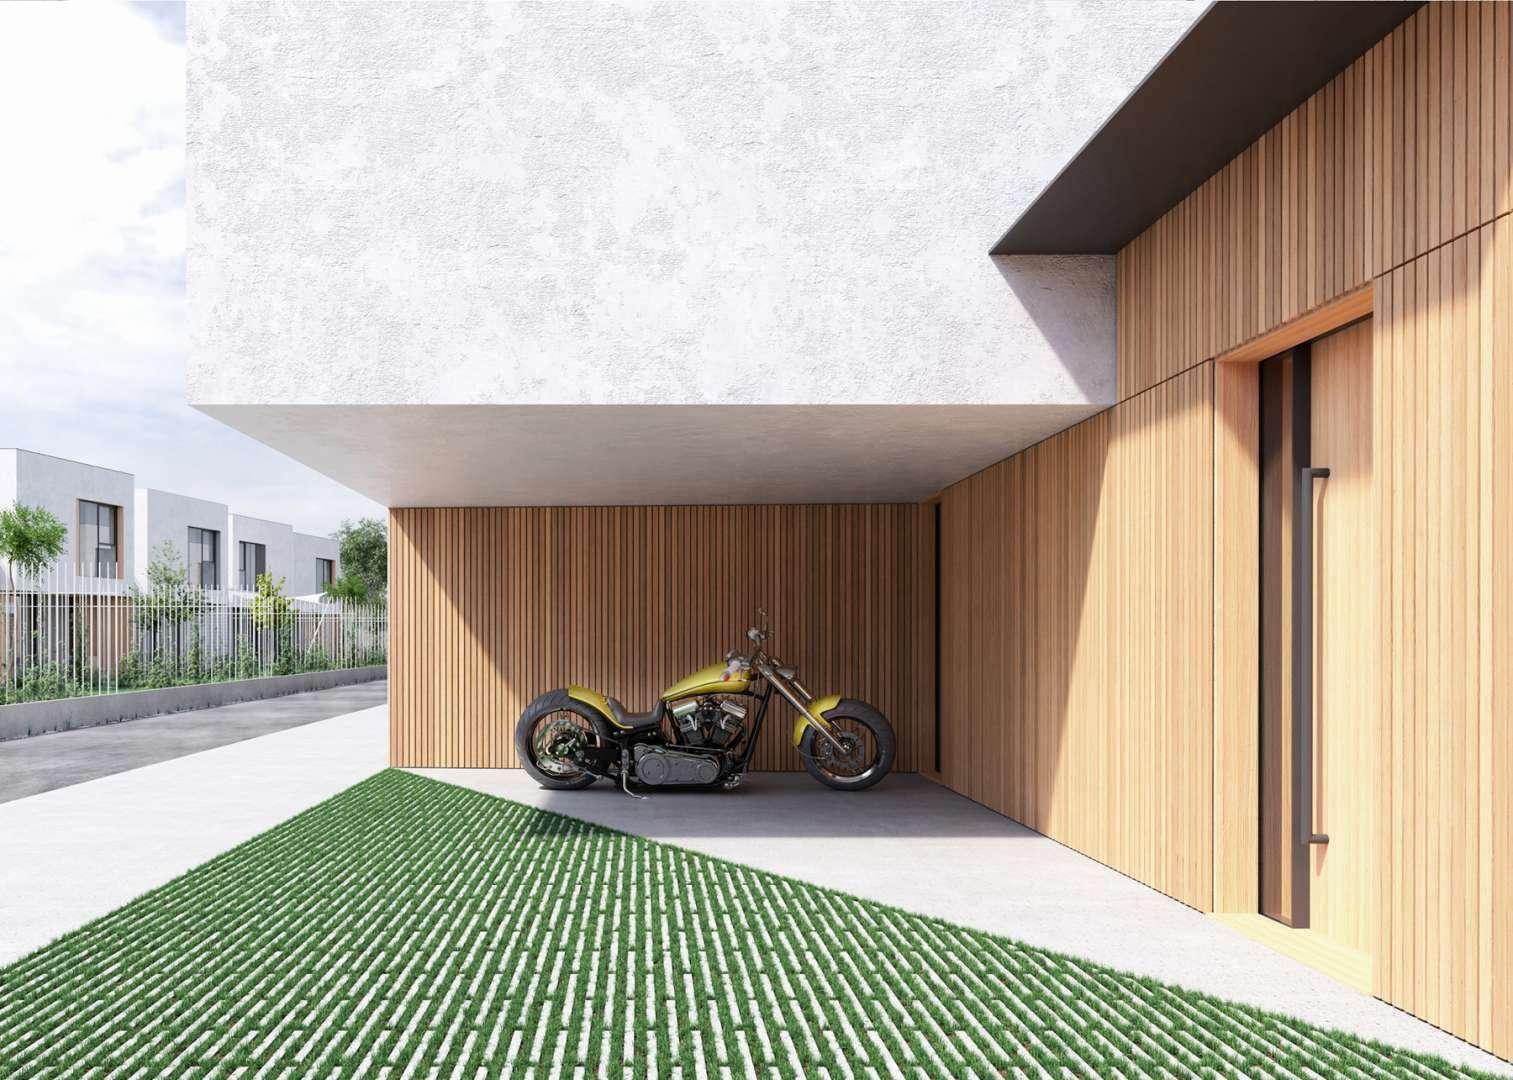 Lesena prezračevana fasada na vrstnih hišah Studenci. Vir: Coinhab Arhitektura